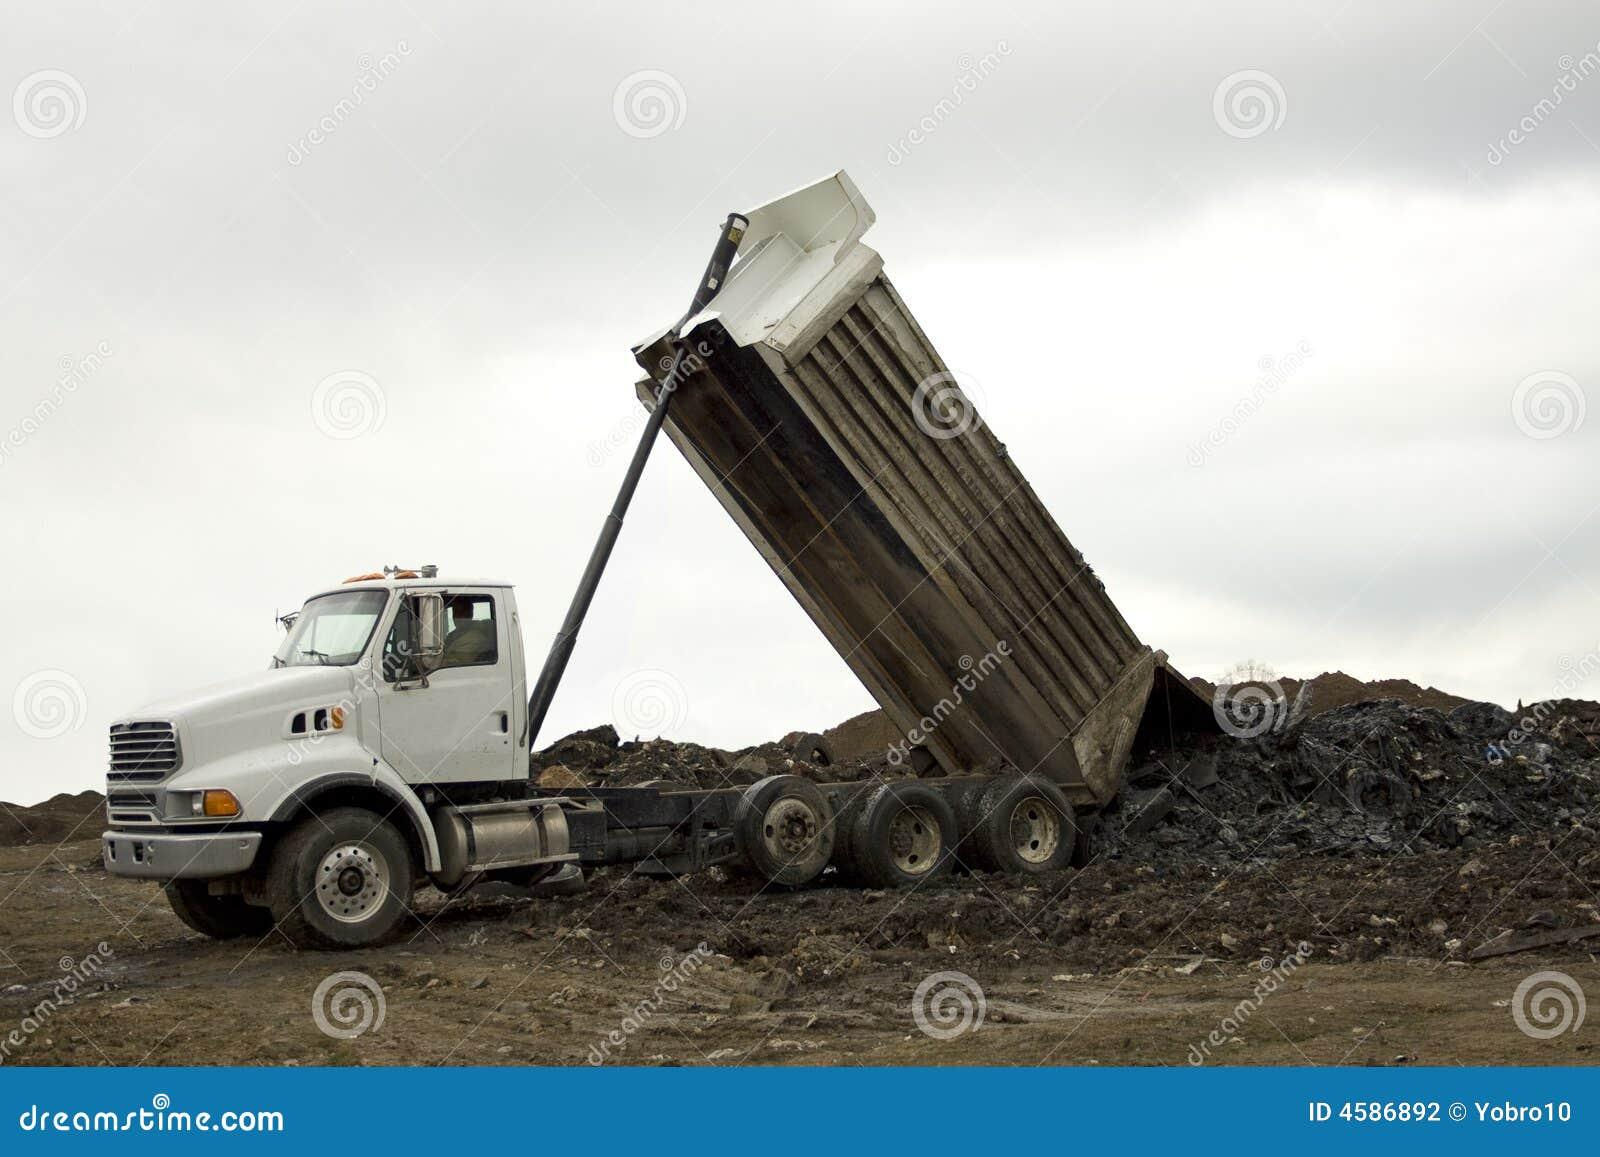 Dump Truck Unloading Stock Photo Image Of Excavator Excavate